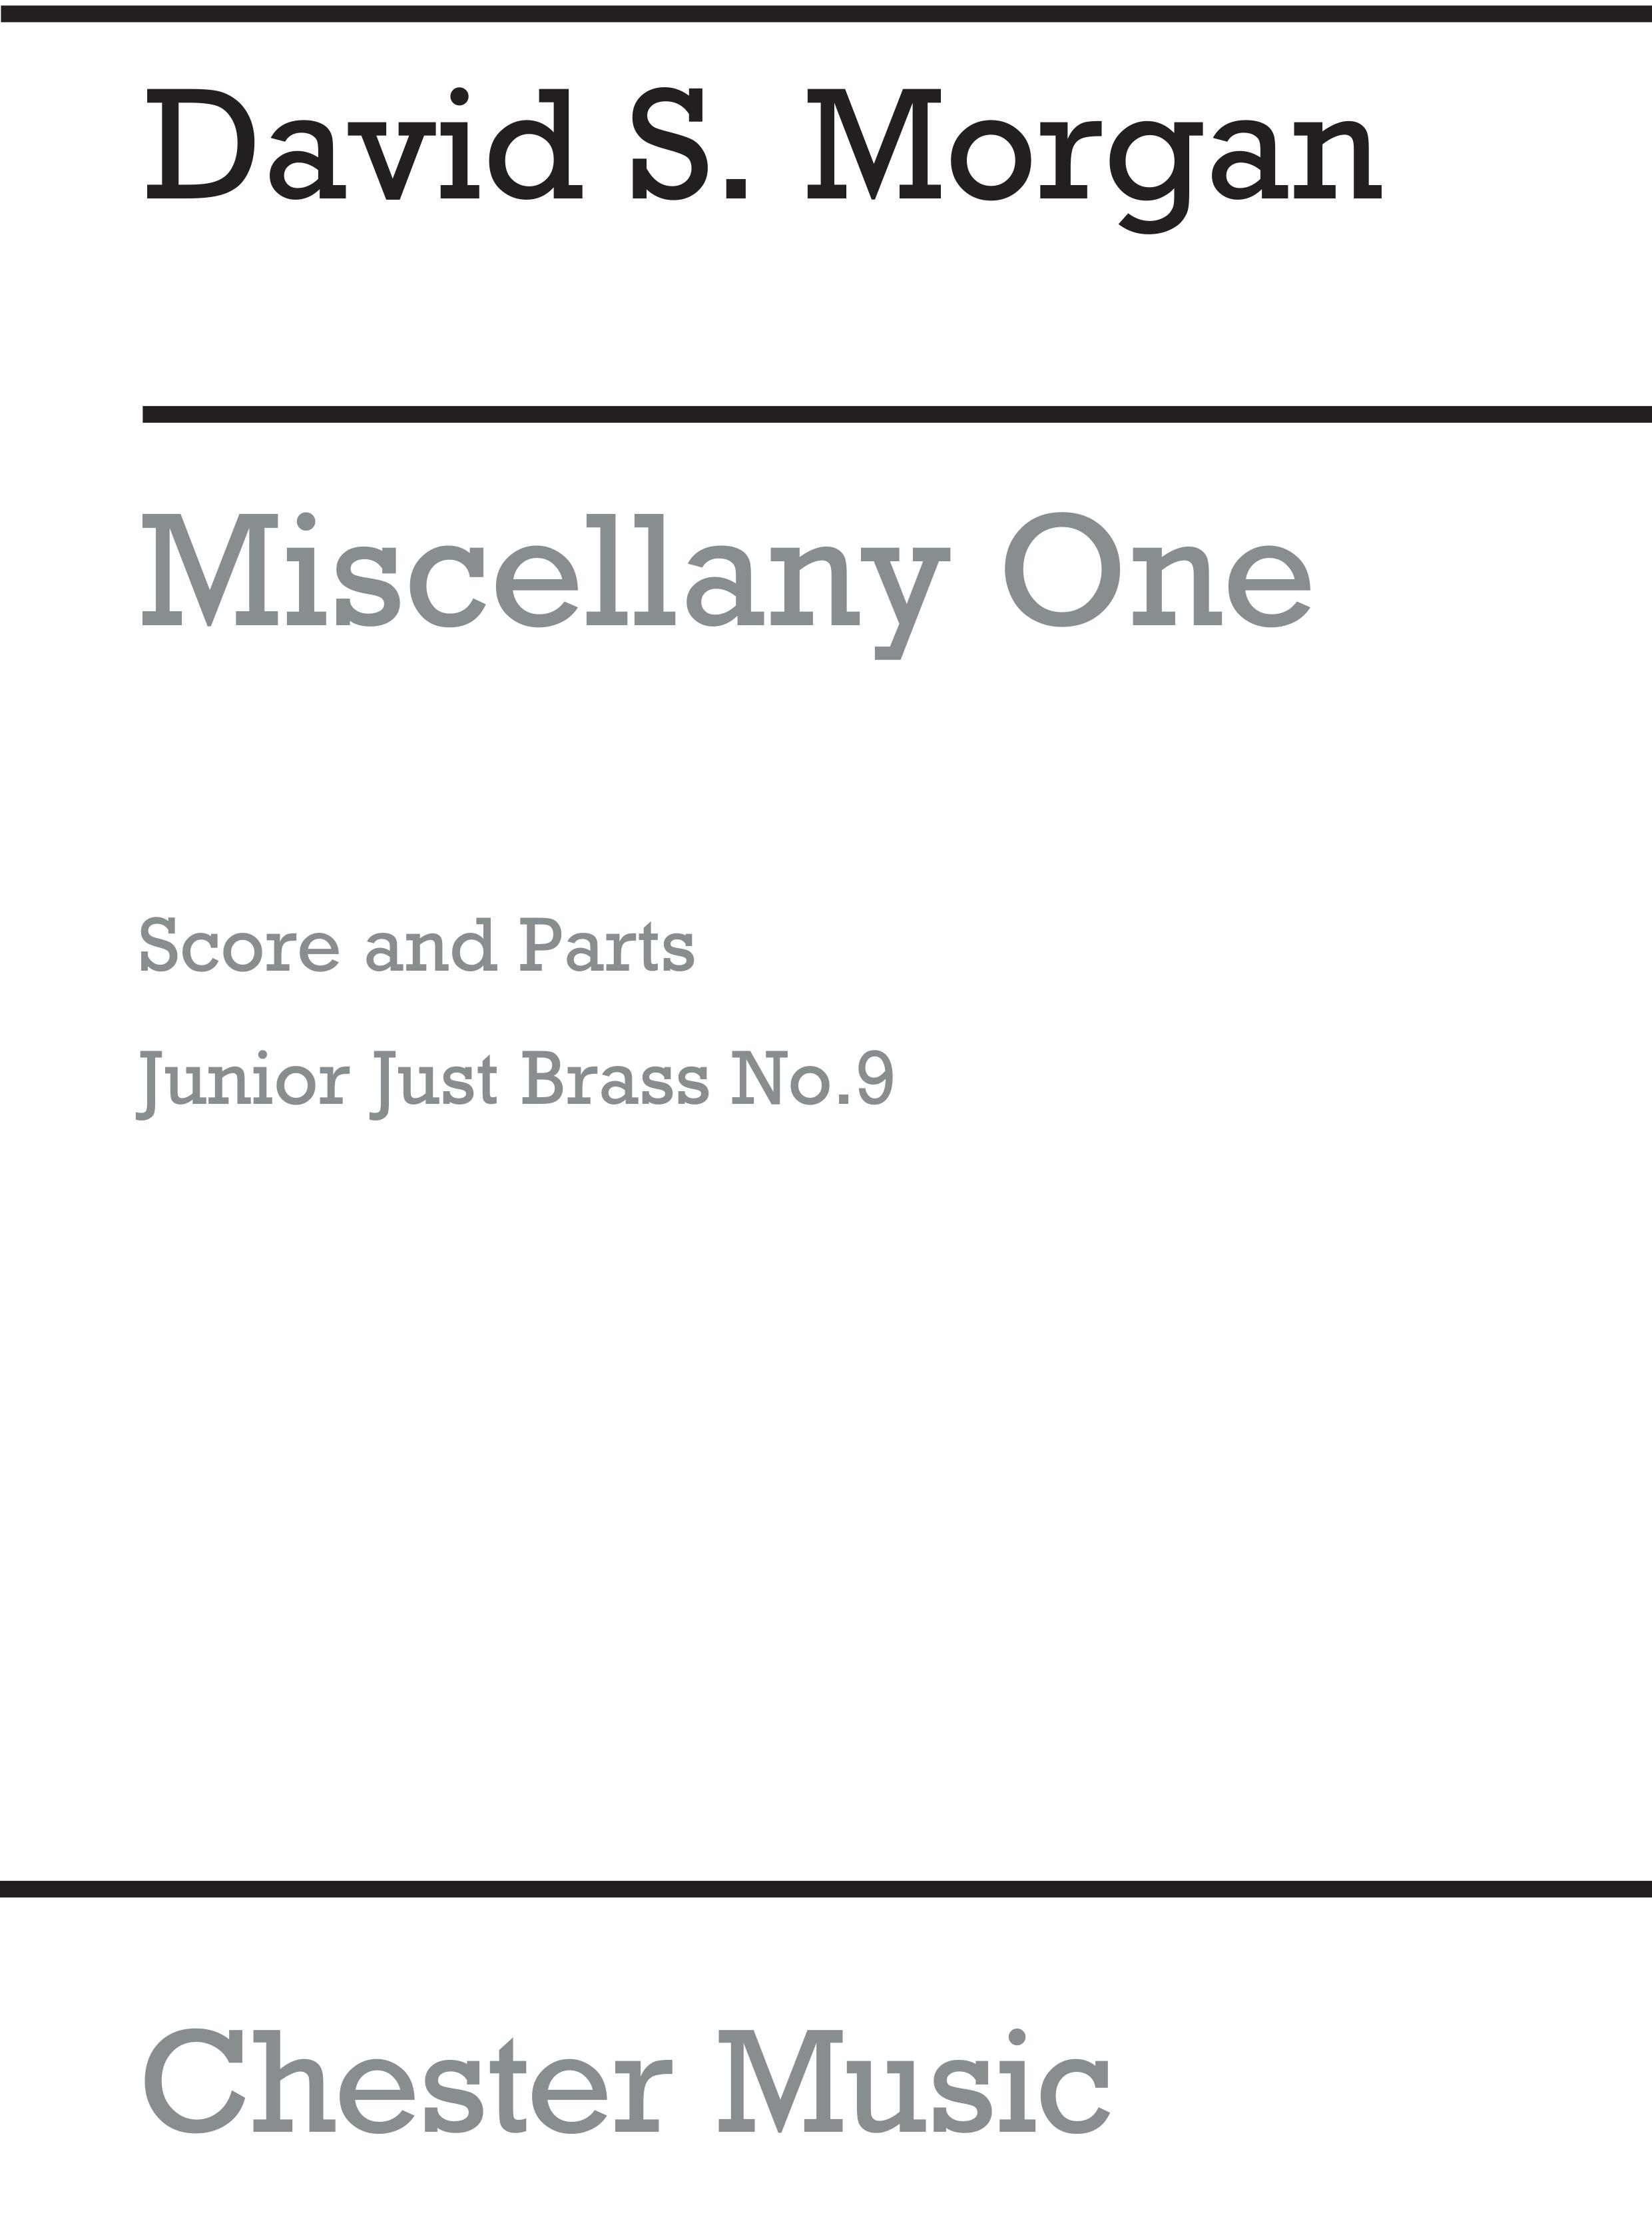 David S. Morgan: Miscellany One: Brass Ensemble: Score and Parts